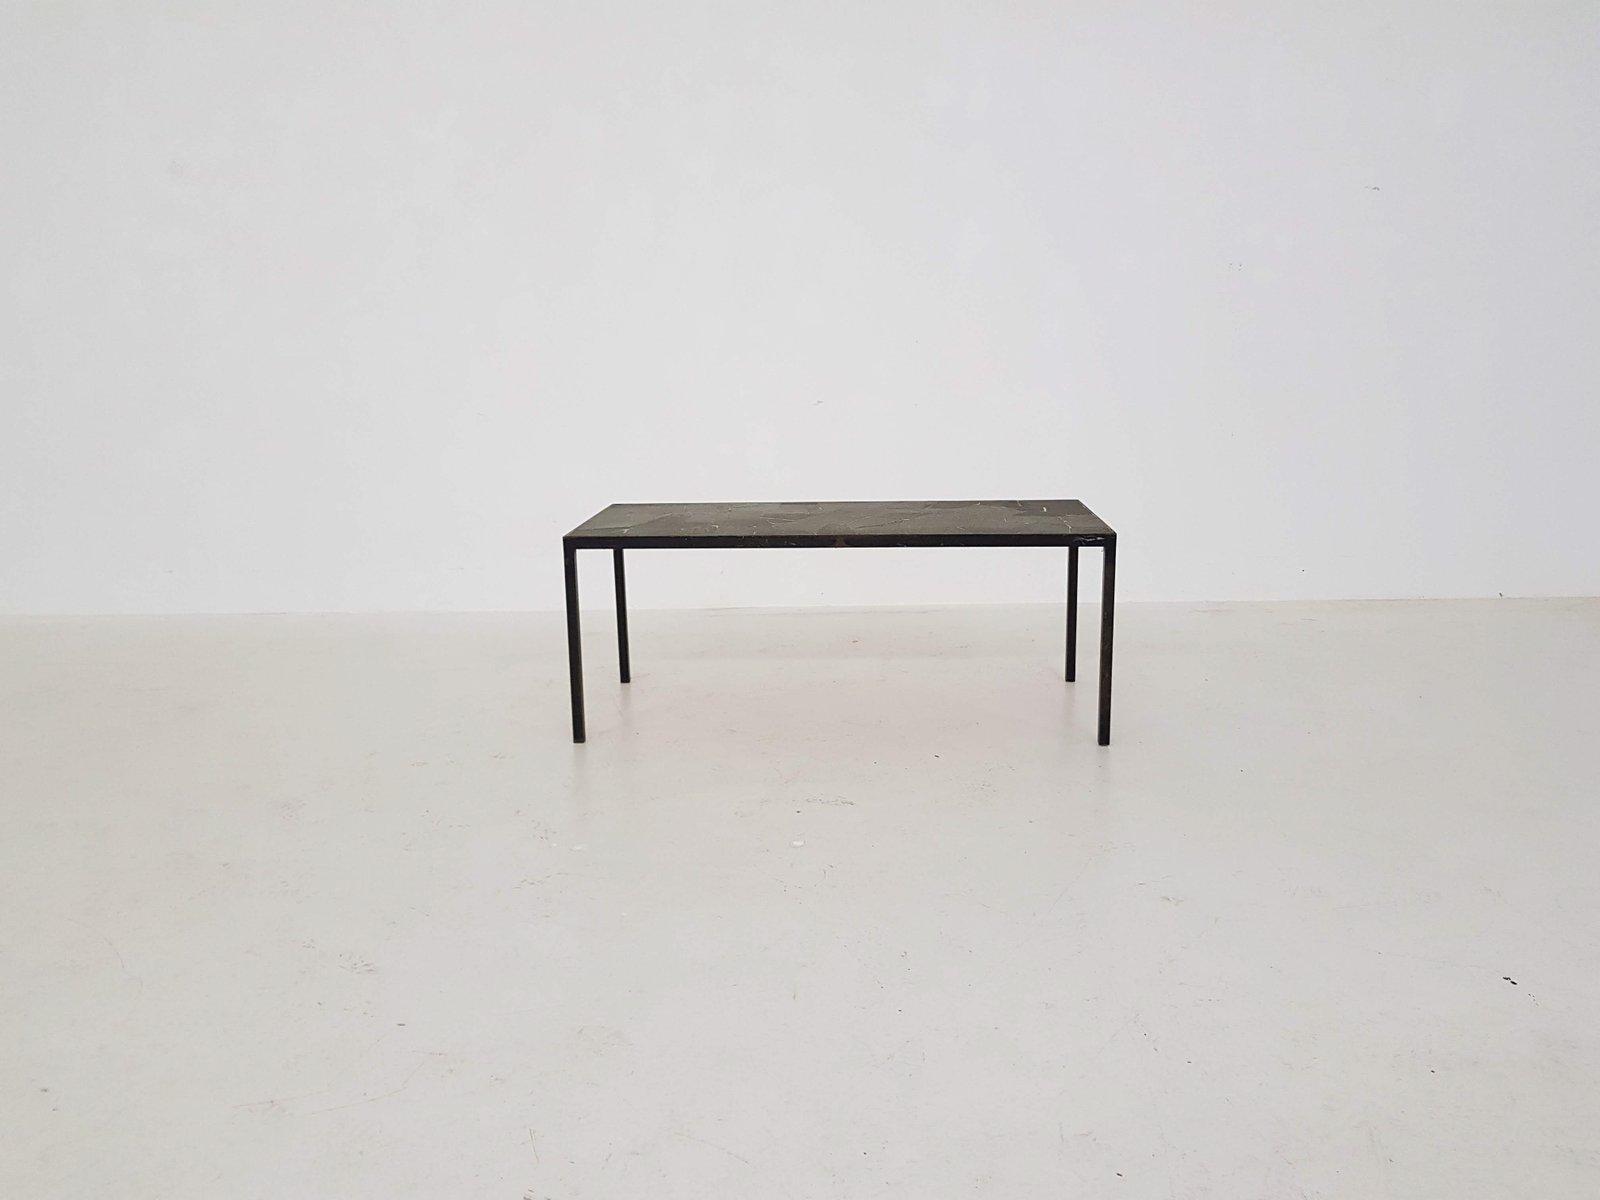 Vintage metal stone coffee table 1970s